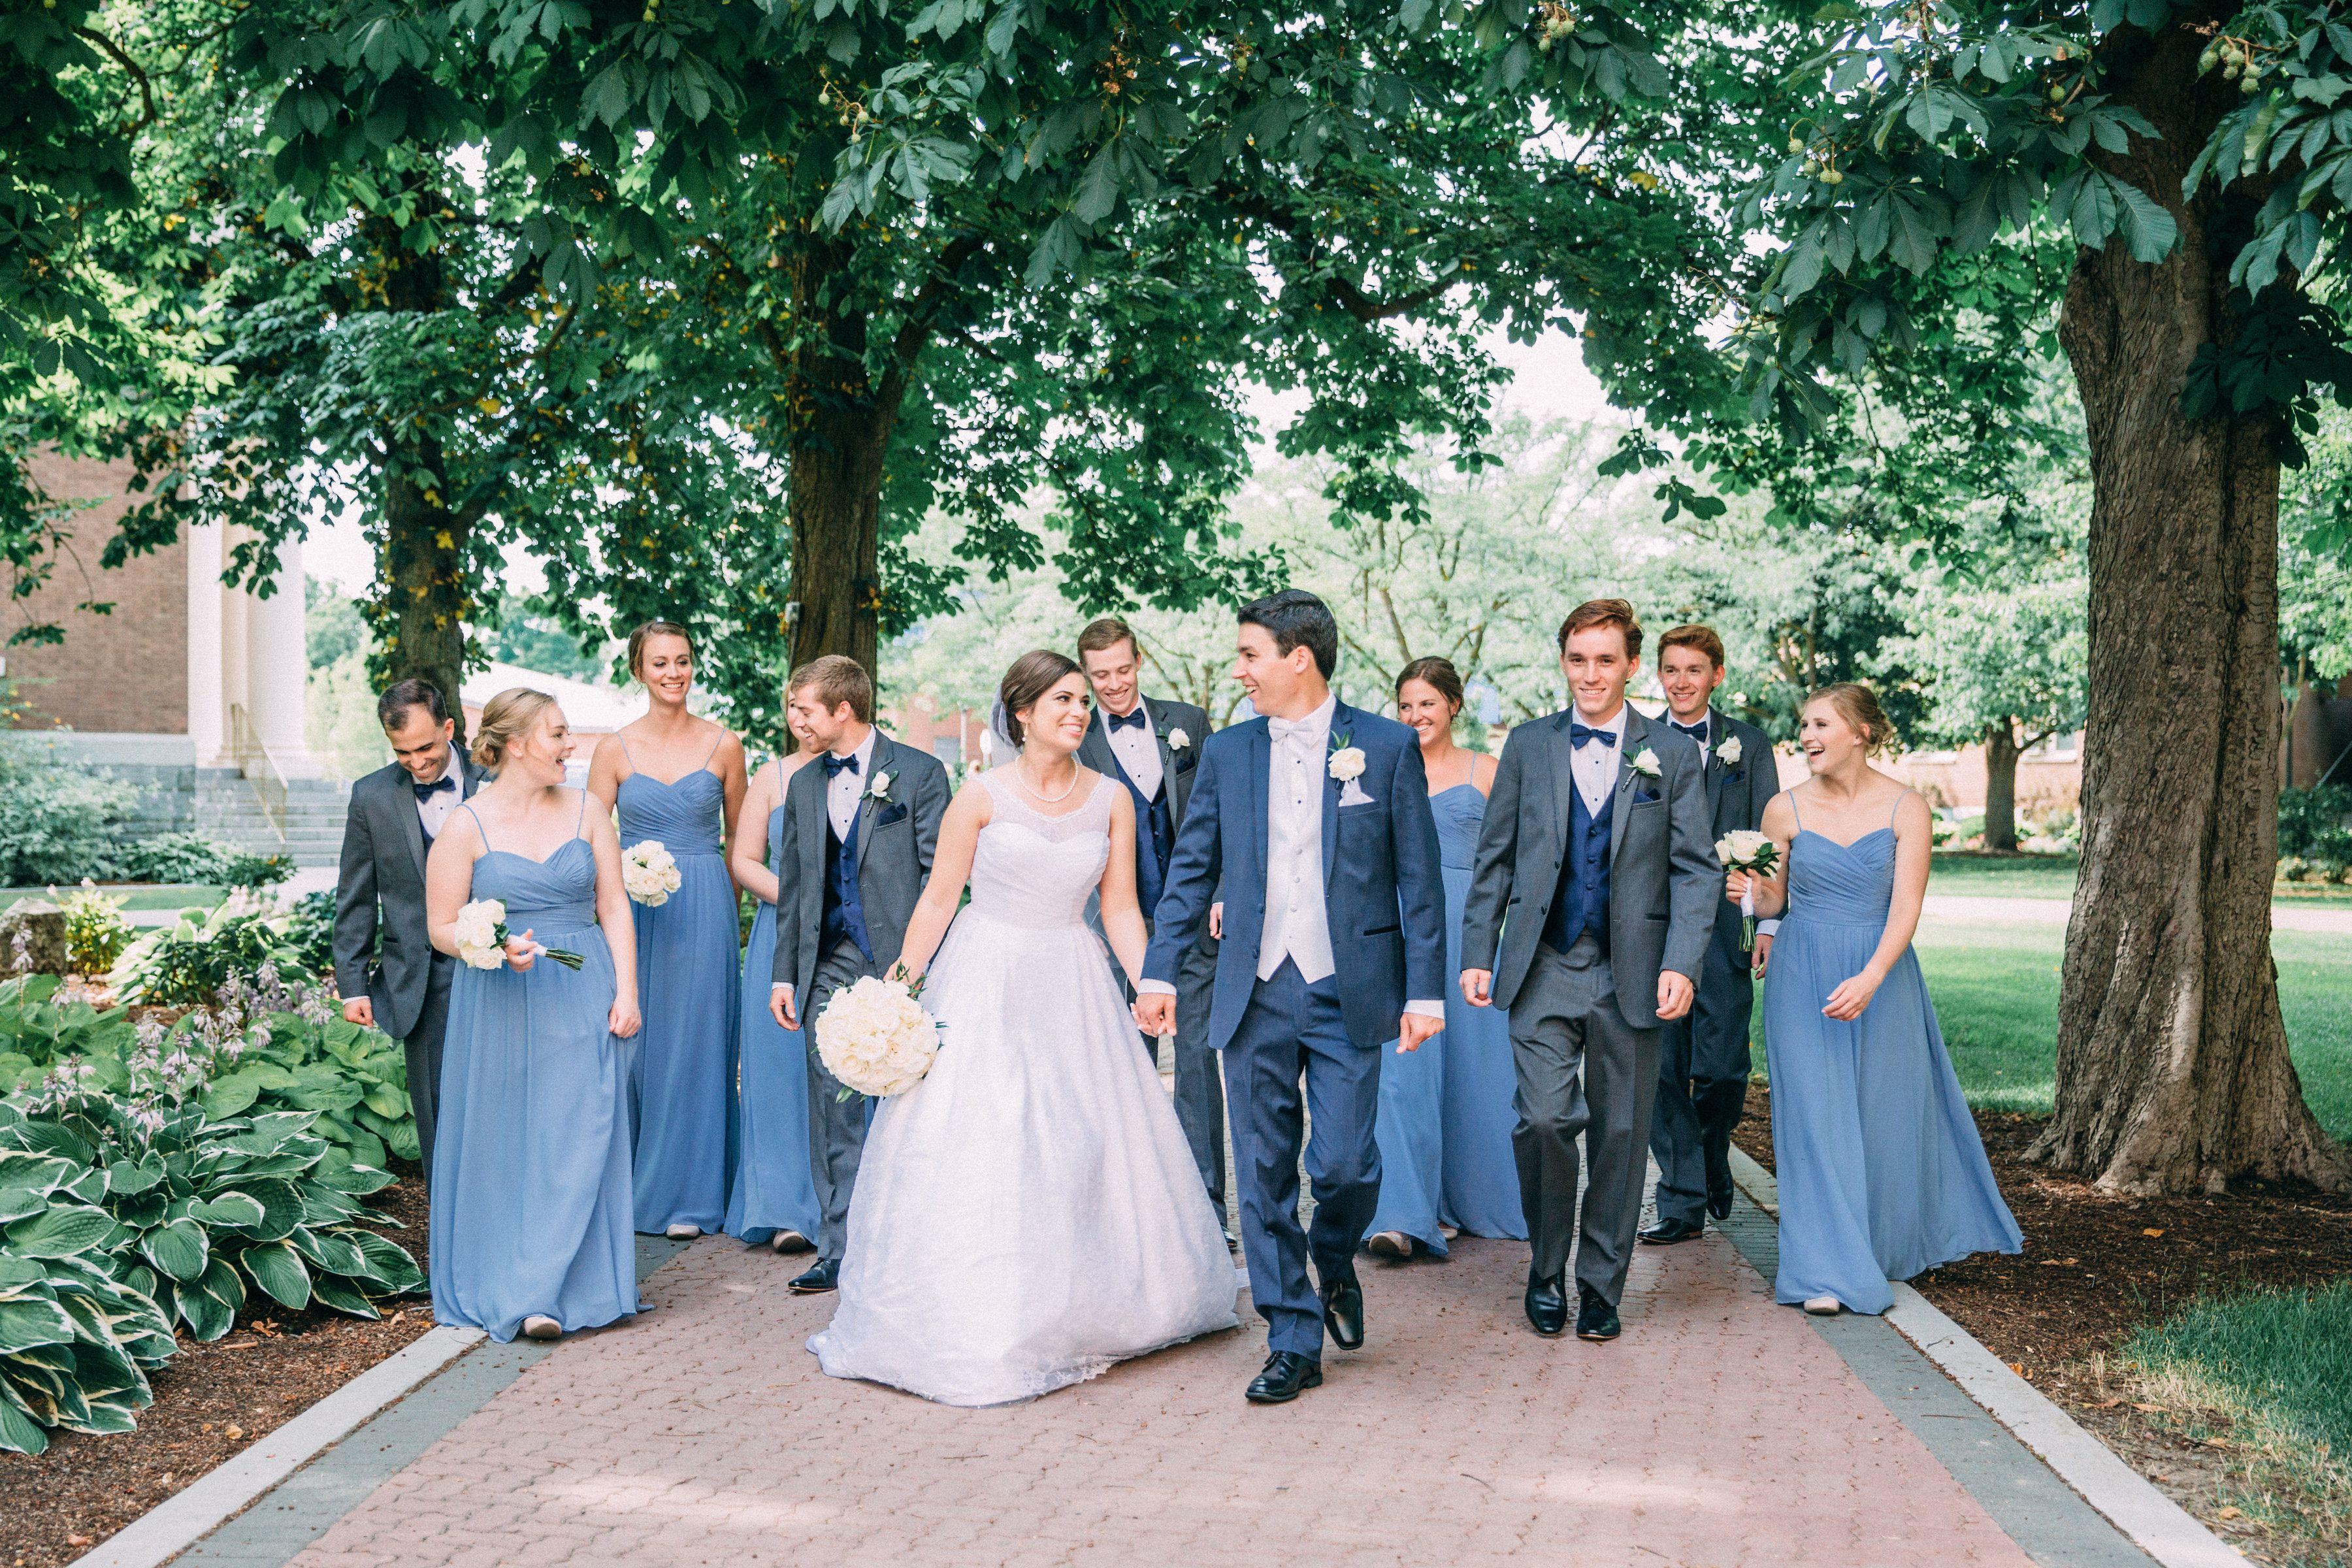 Slate blue bridesmaid dresses, groomsmen in charcoal gray ...